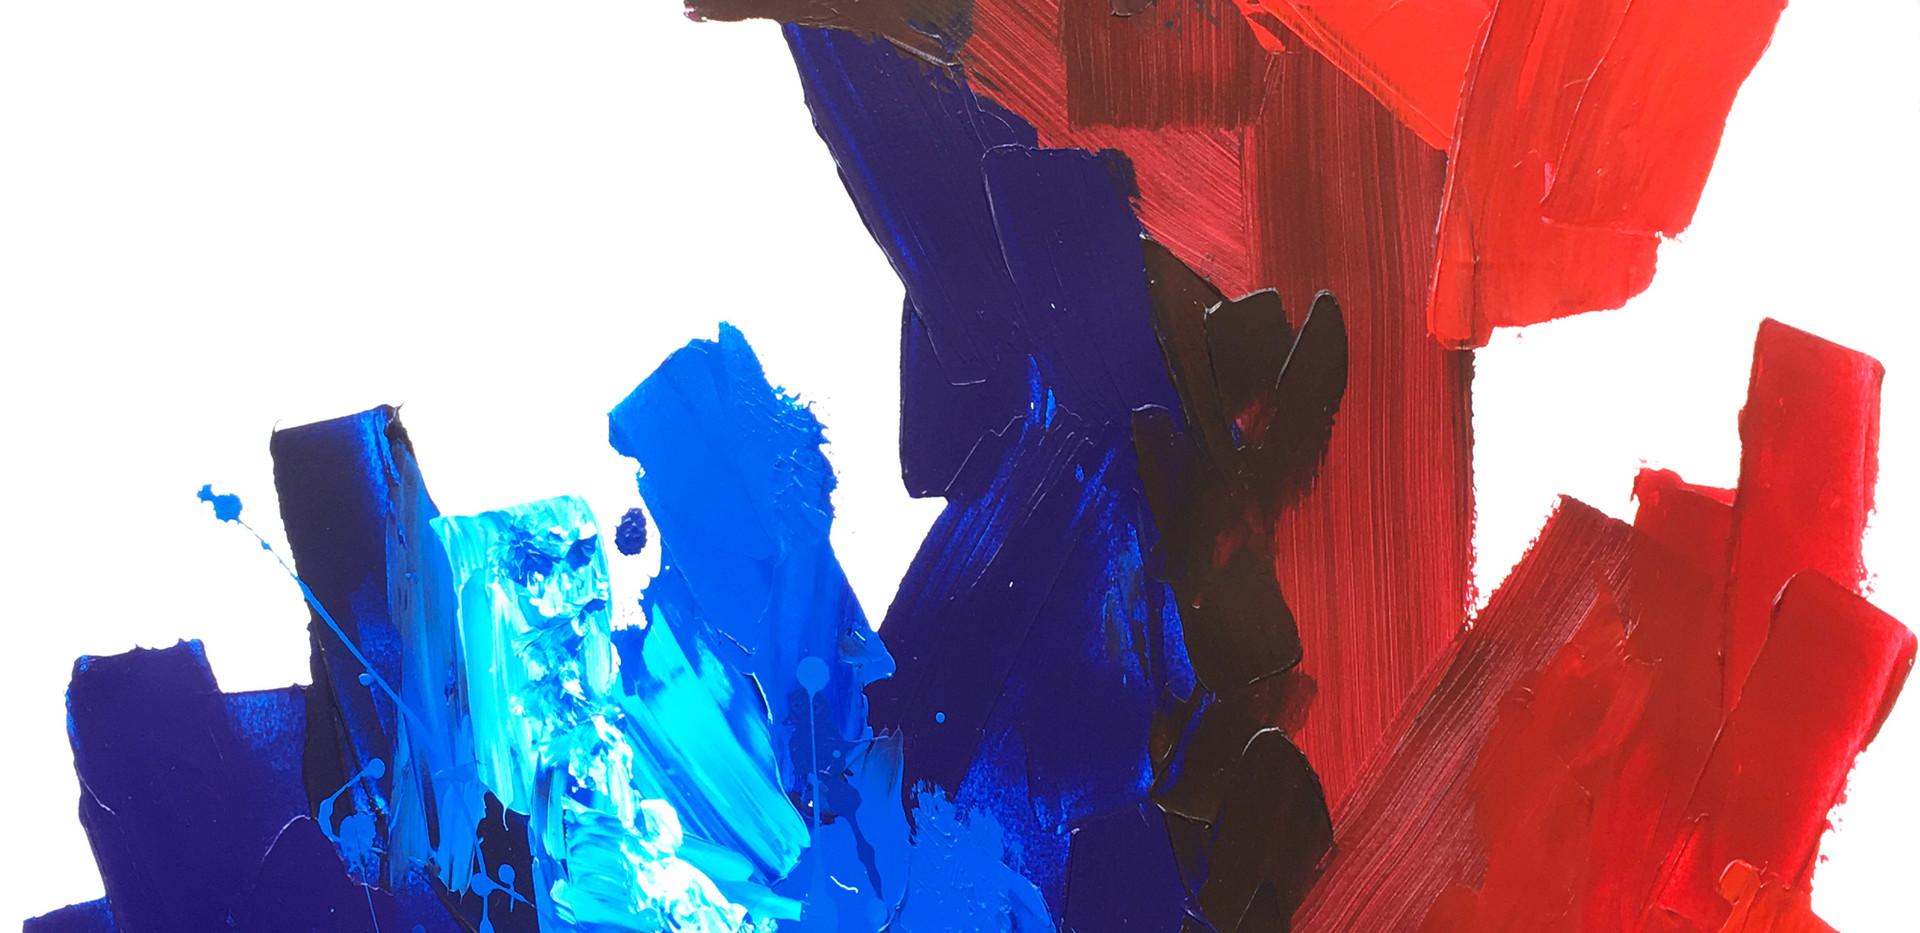 Karina Matheus - The Art is Alive! II